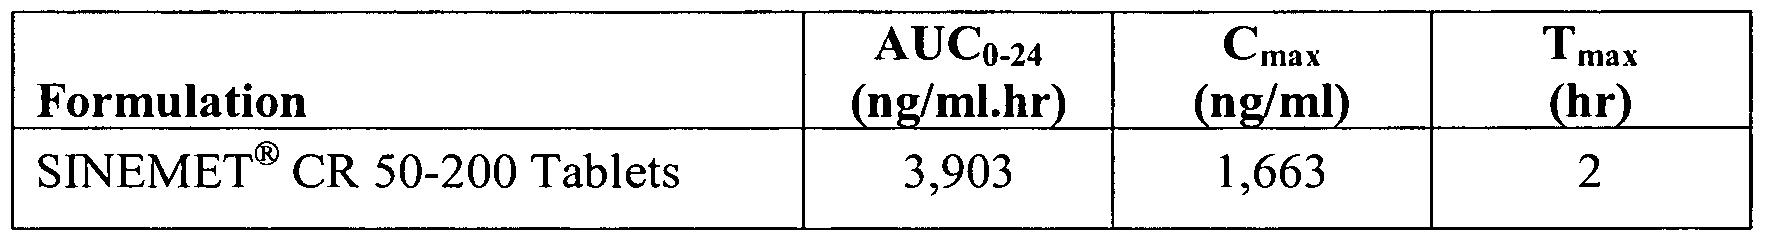 furosemide 20 mg dosage for dogs